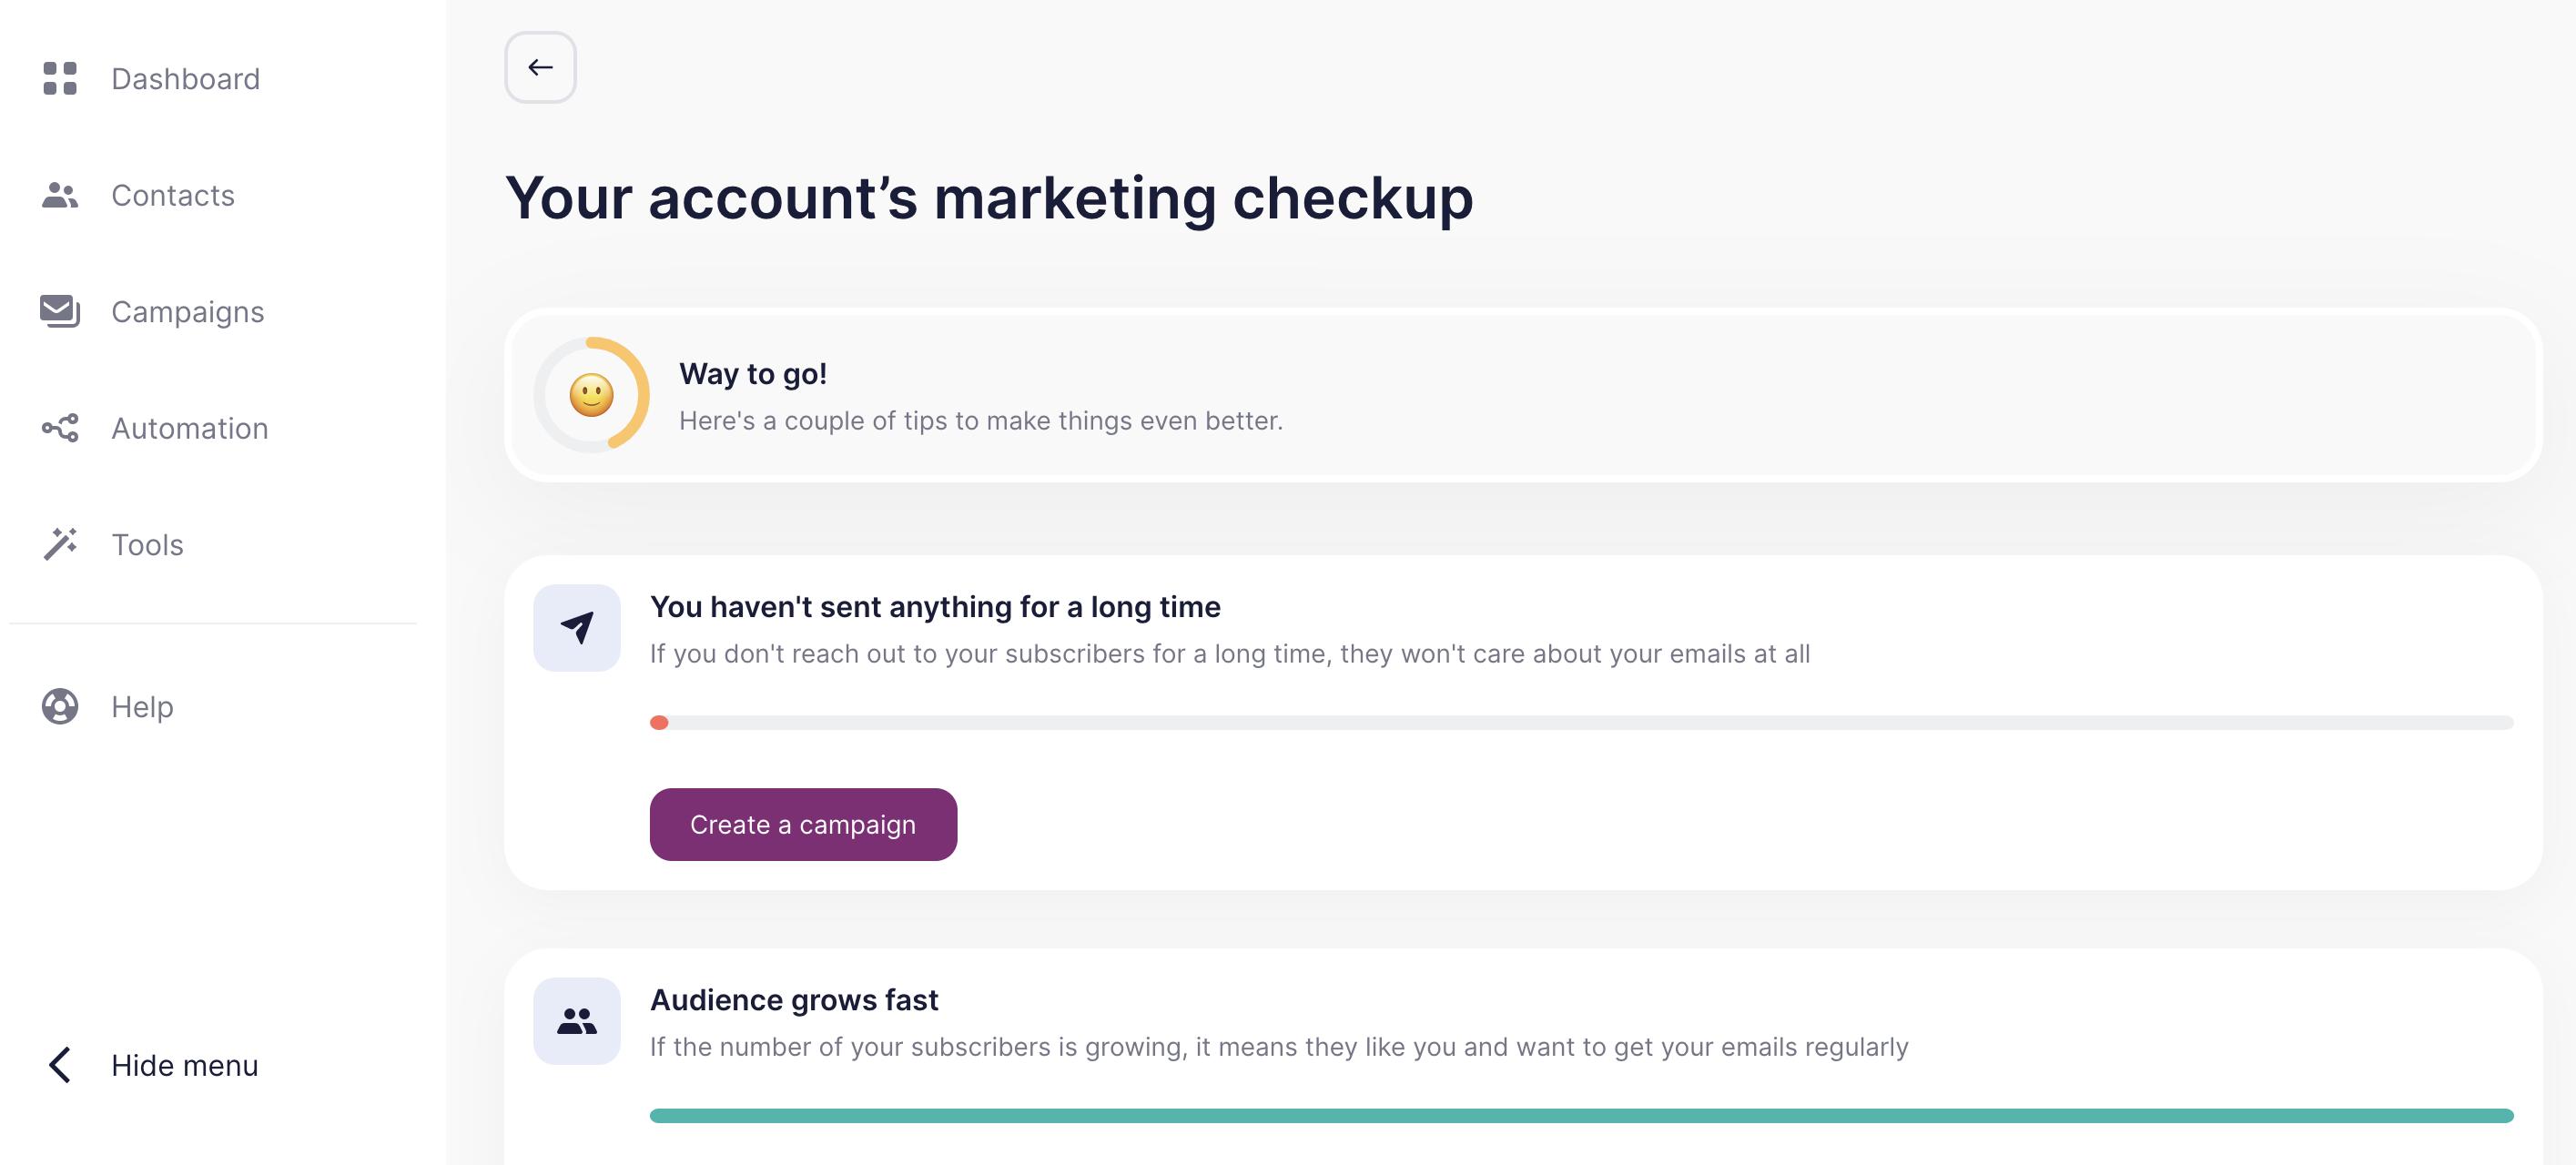 Unisender marketing checkup tool dashboard